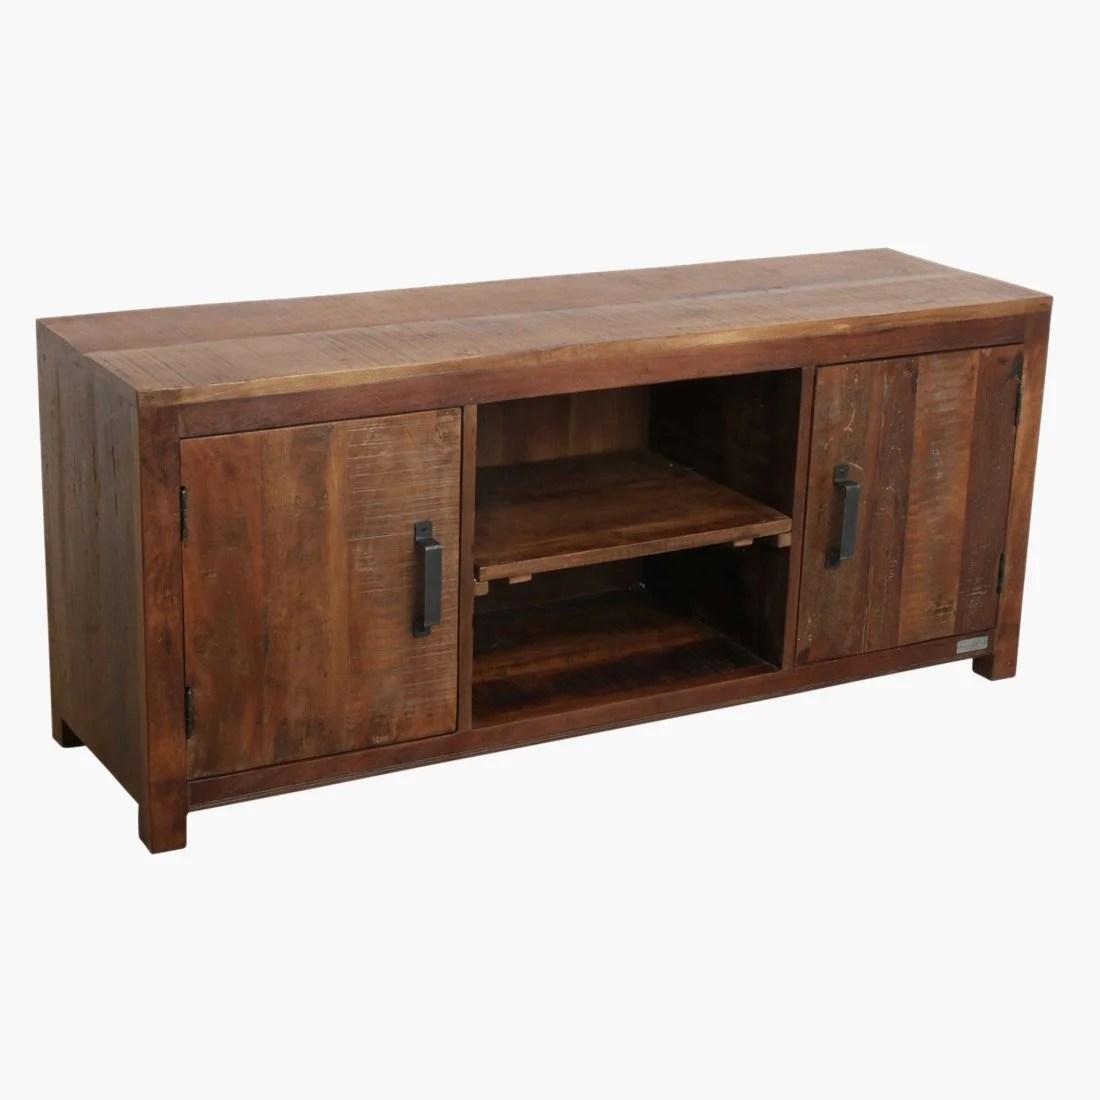 petite lily interiors meuble tv bois naturel 140x40xh60cm